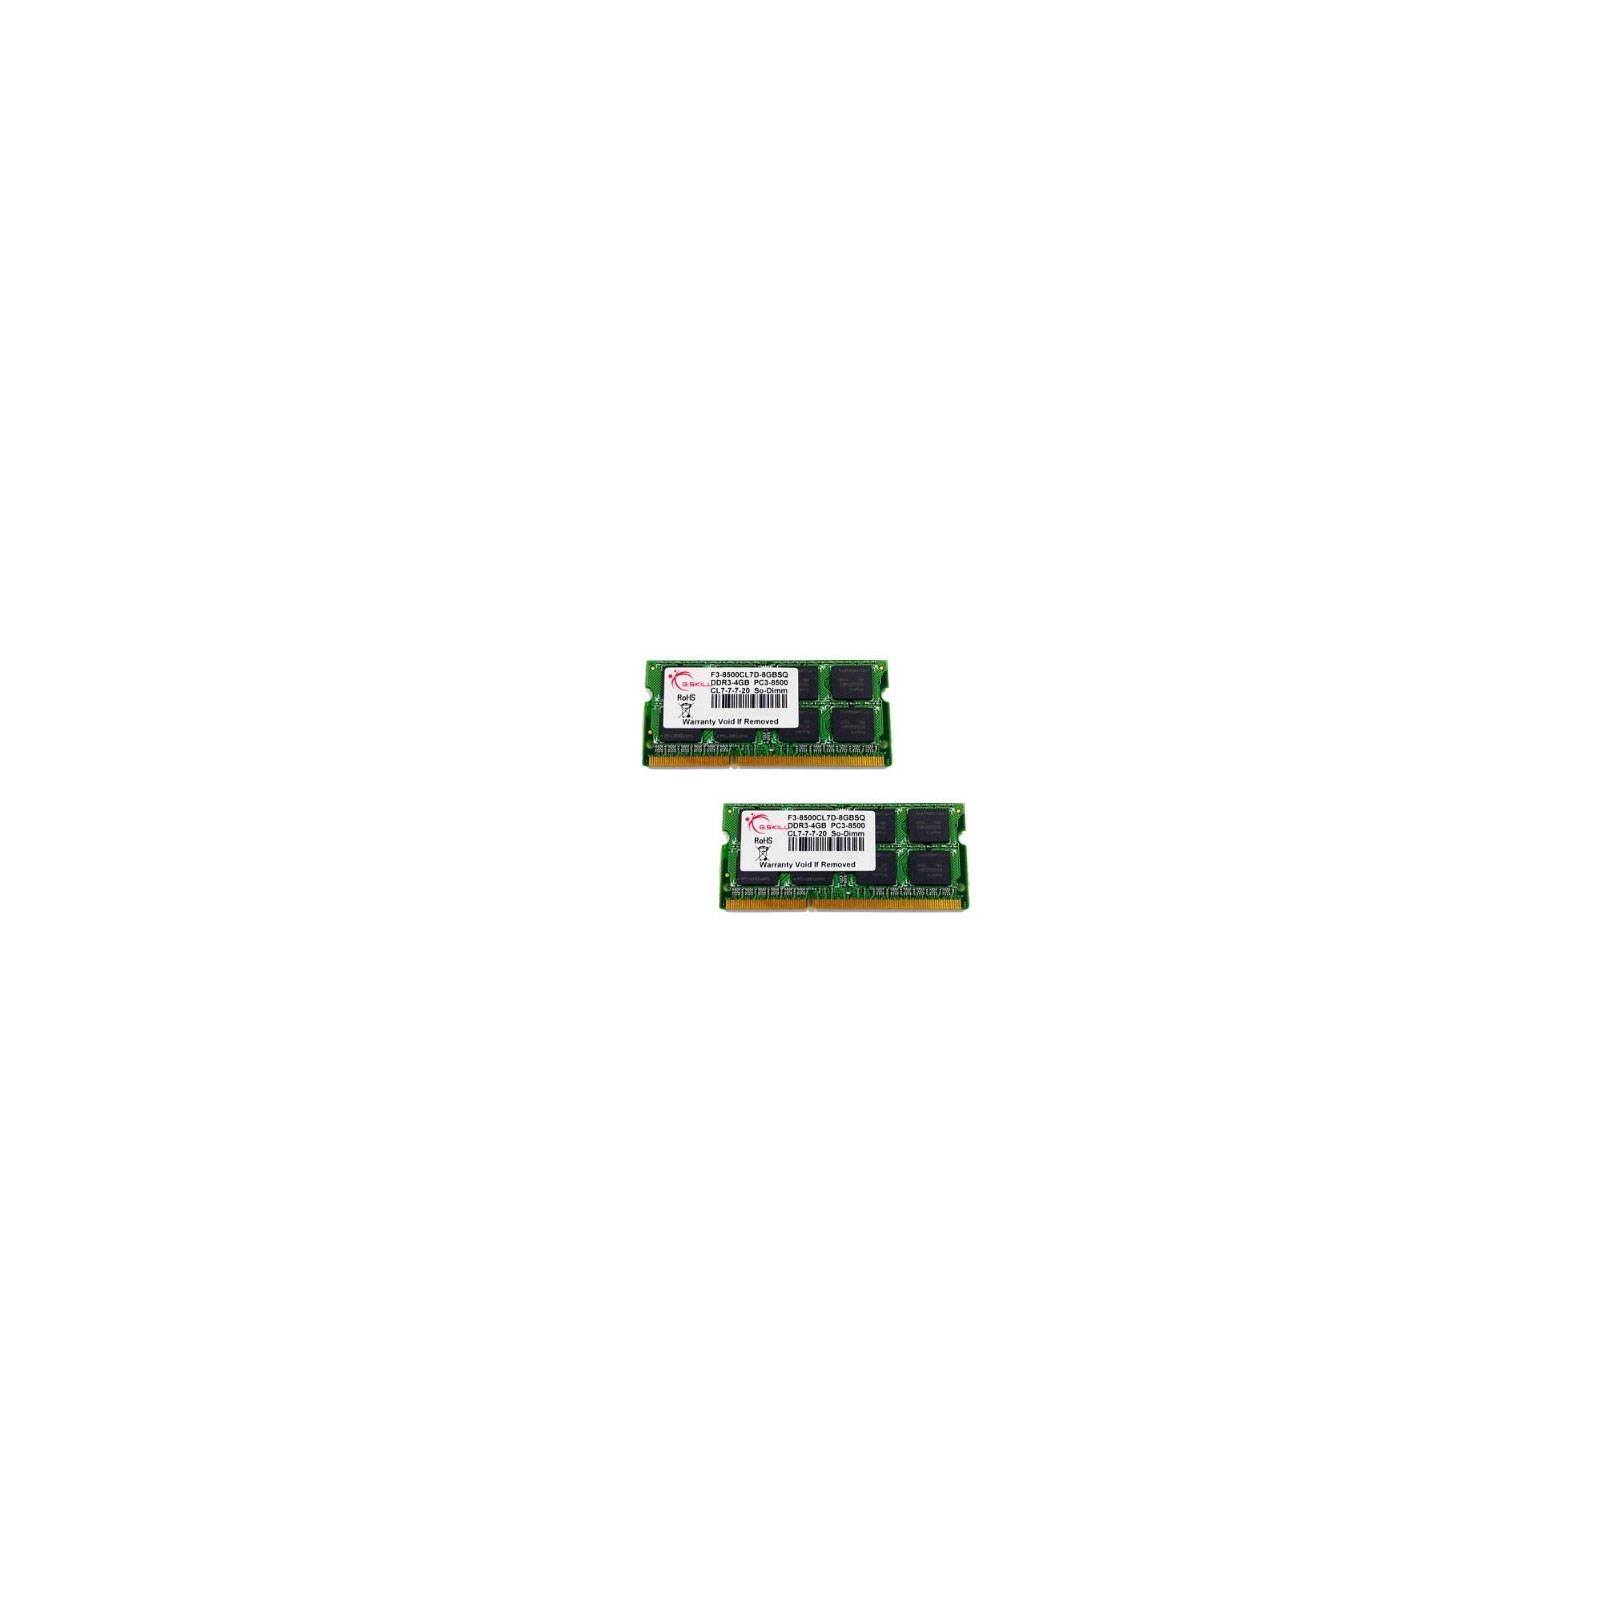 Модуль памяти для ноутбука SoDIMM DDR3 8GB (2x4GB) 1066 MHz G.Skill (F3-8500CL7D-8GBSQ)